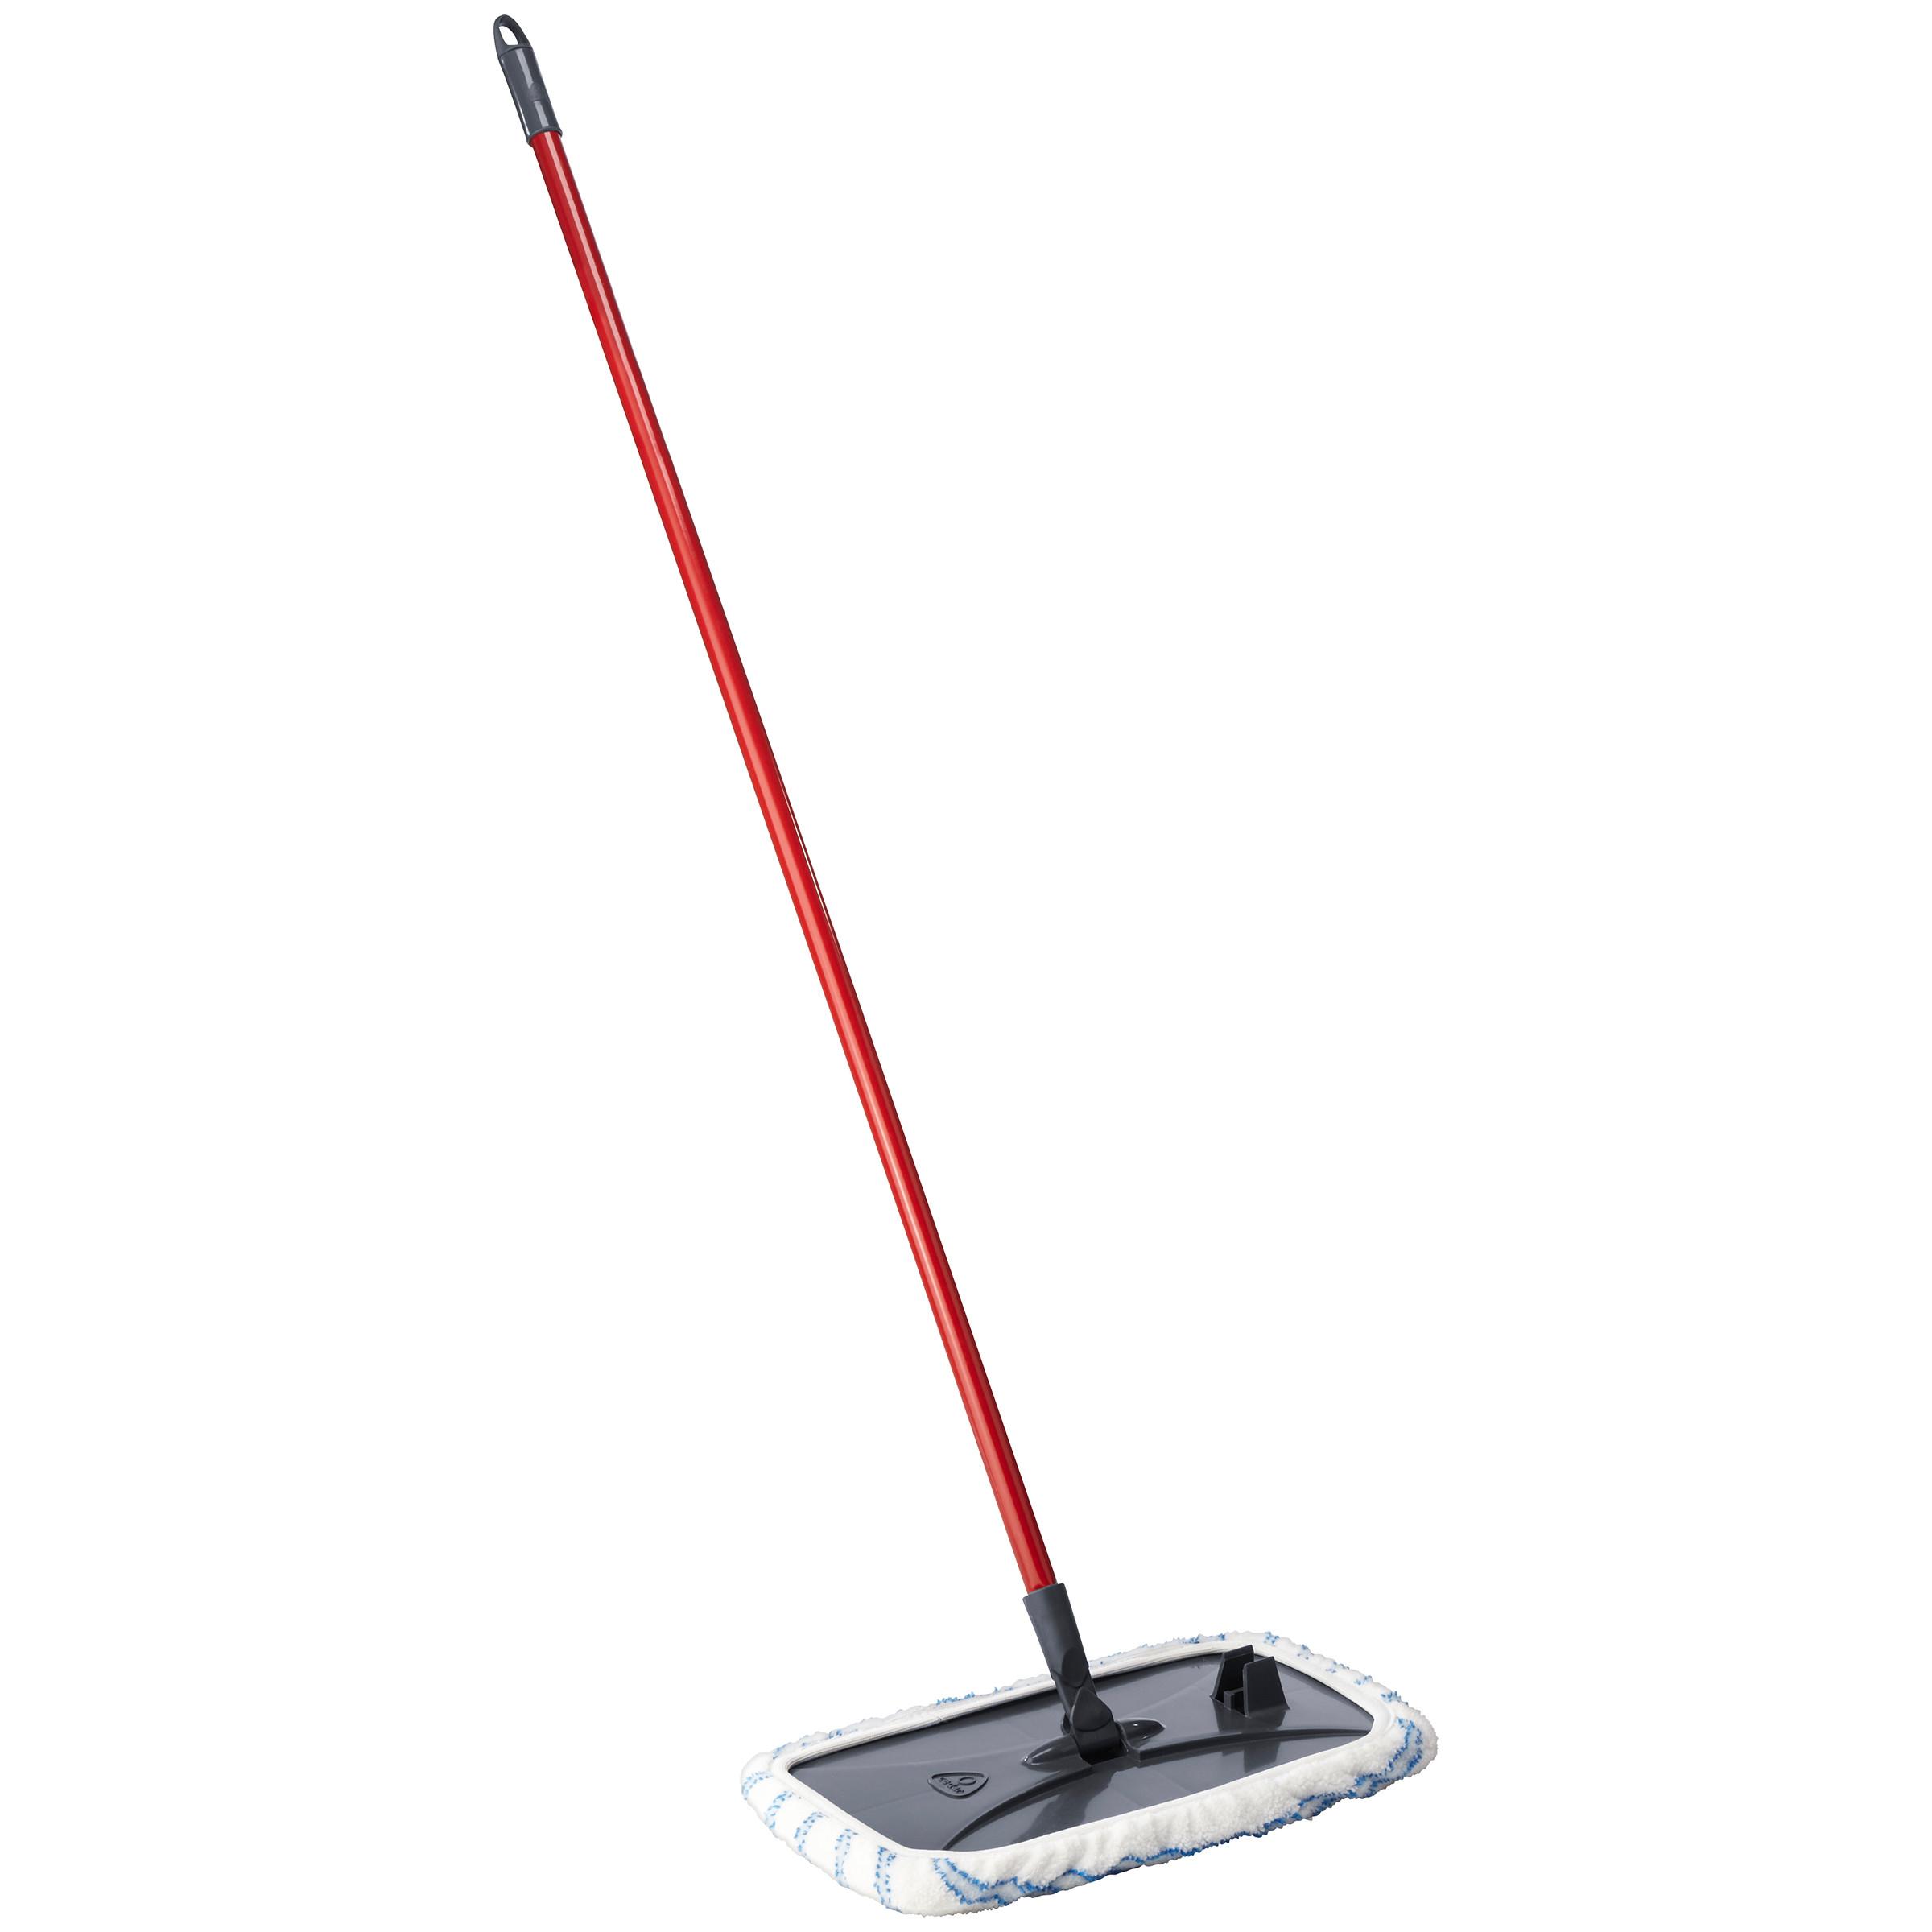 electric mops for hardwood floors of o cedar hardwood floor n more mop walmart com inside 5c59a591 a0e3 41dc a0f2 a38e02eb4ef2 1 af885ac9cdfc29da85414f4dba6b9980